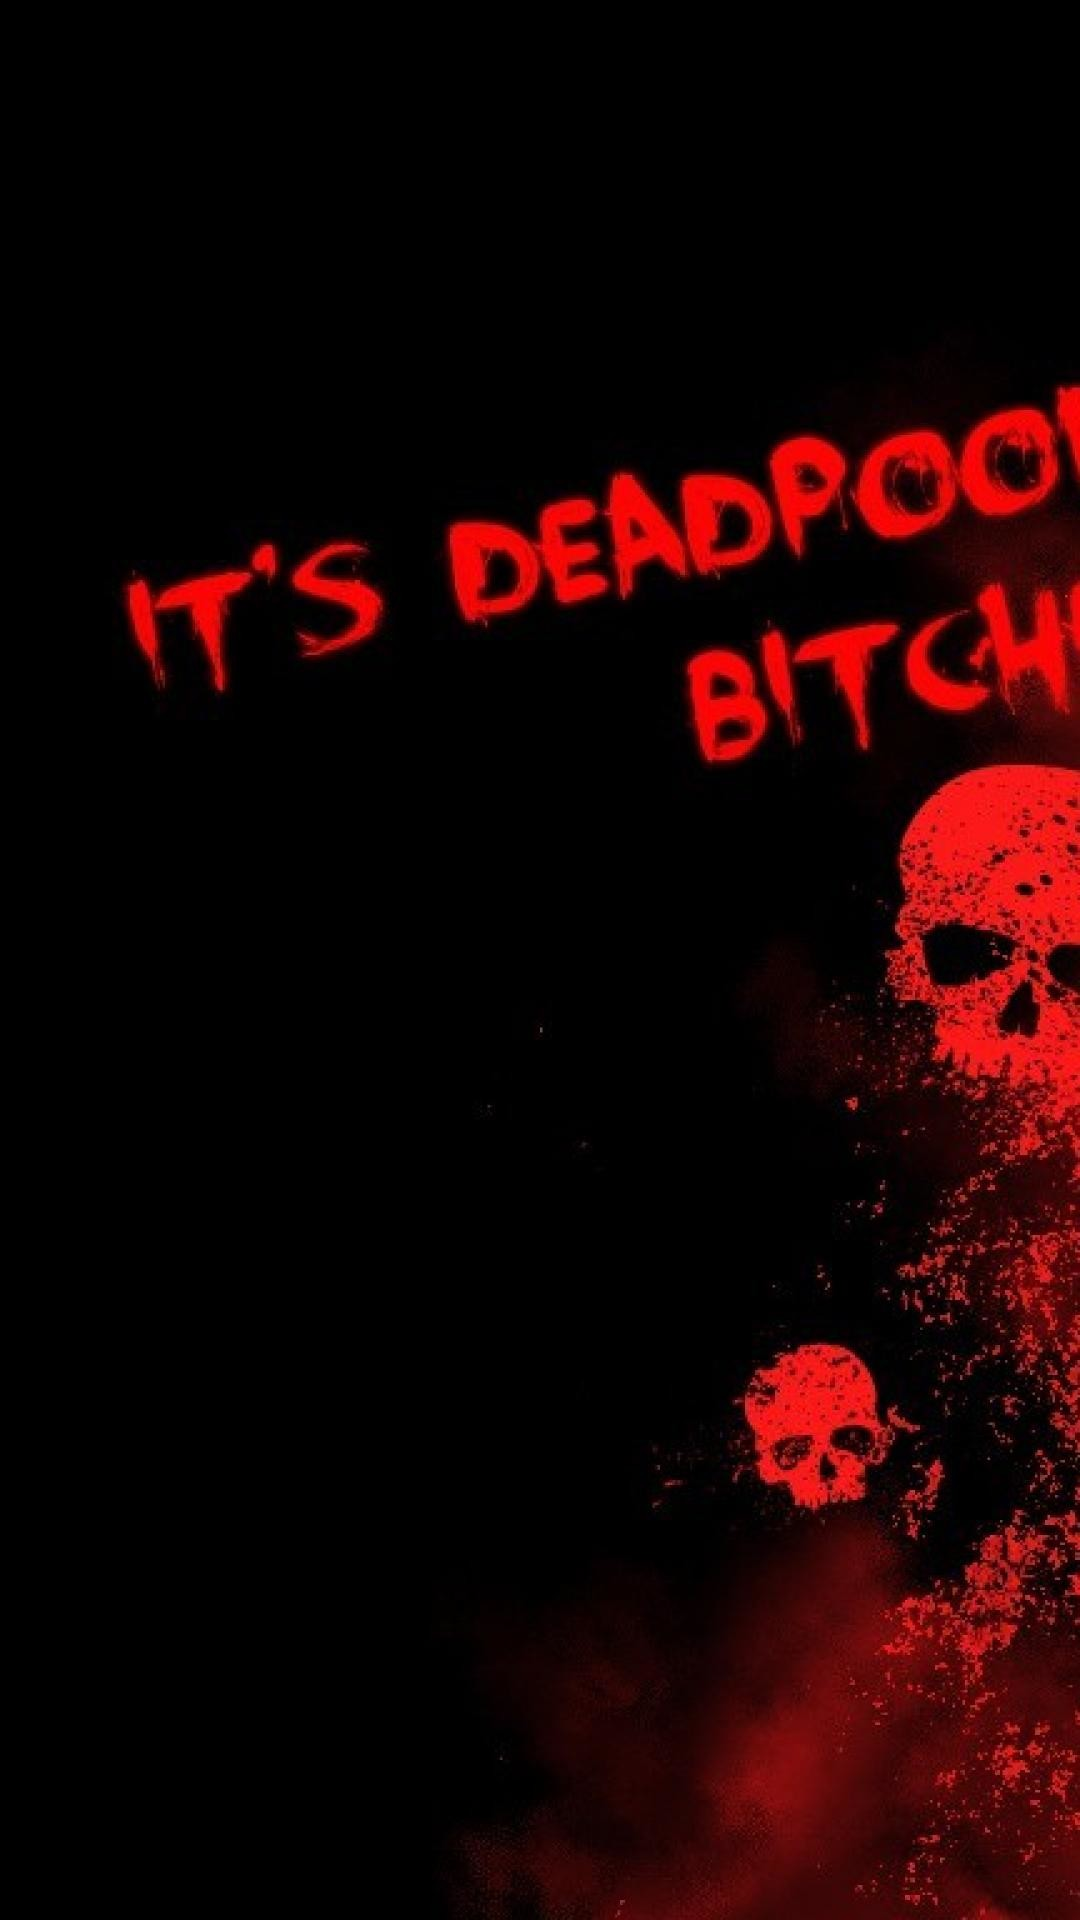 Deadpool Iphone 6 Wallpaper 82 Images